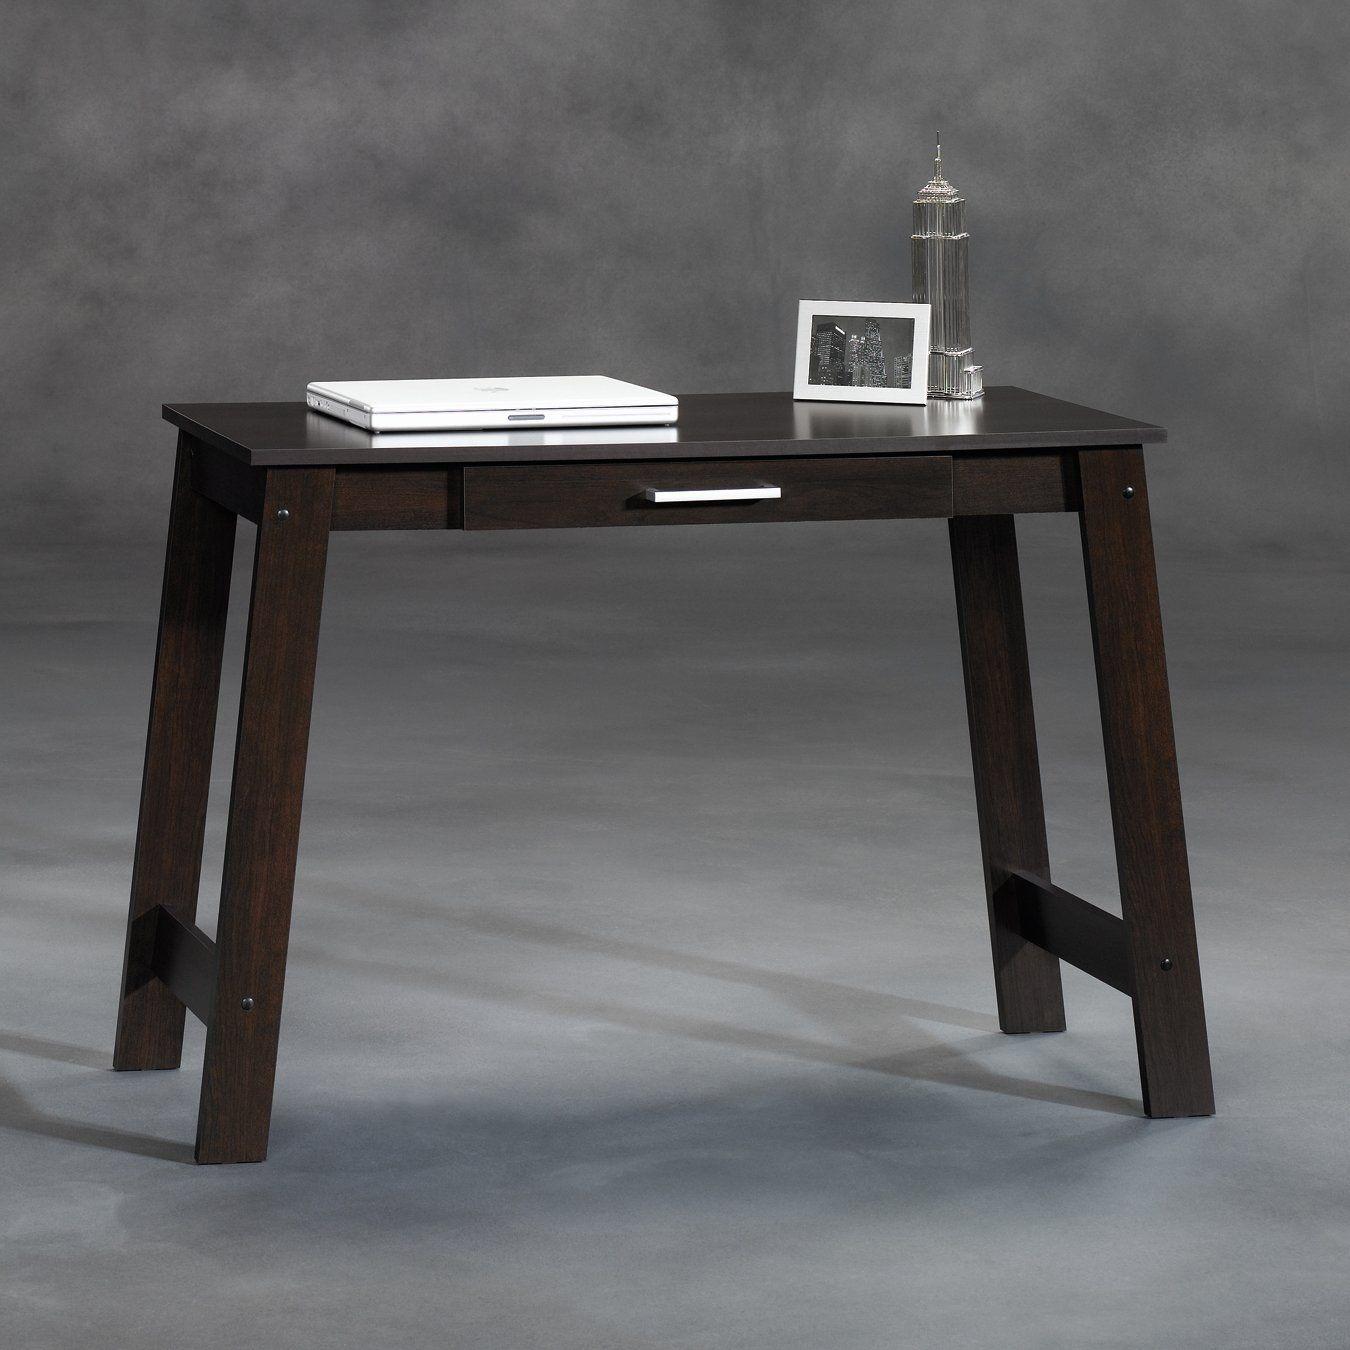 Sauder 410421 Beginnings Writing Table ATG Stores